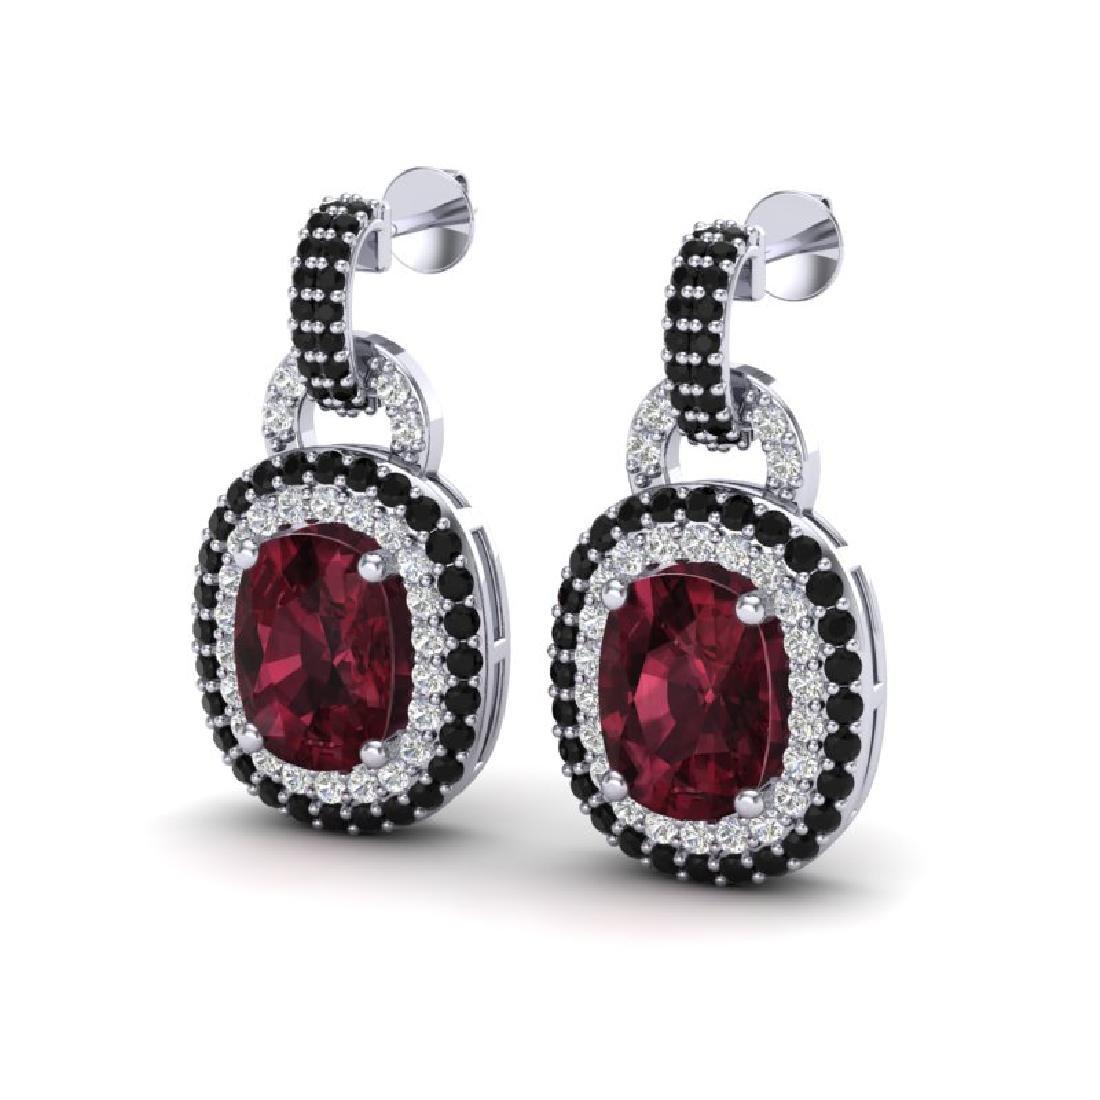 5 CTW Garnet With Black & Micro VS/SI Diamond Earrings